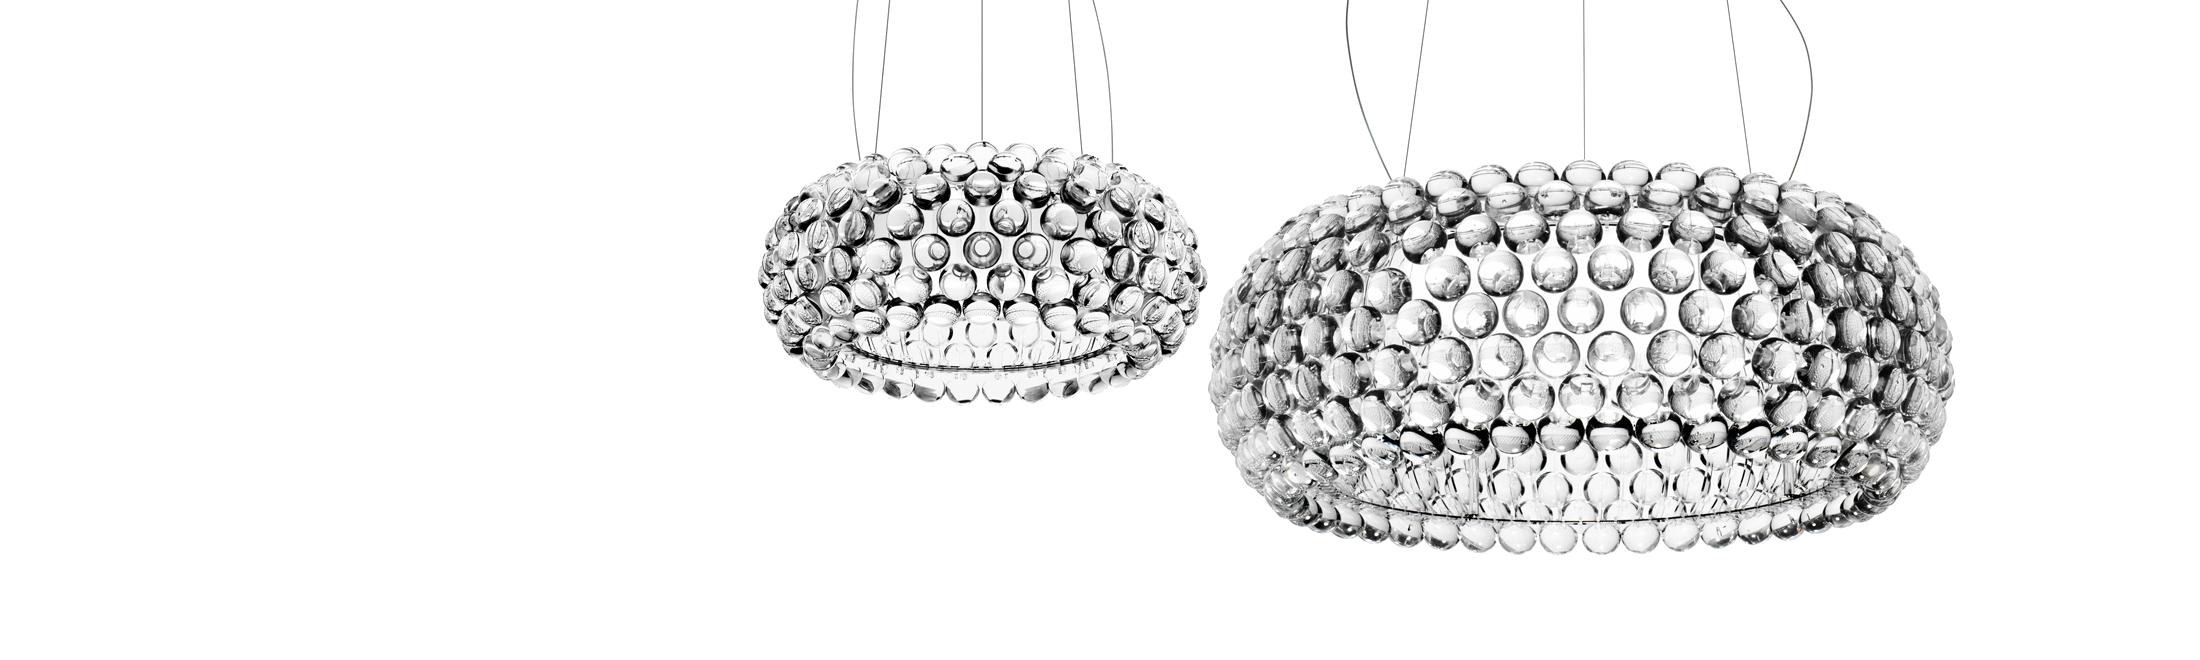 Suspension Lamps